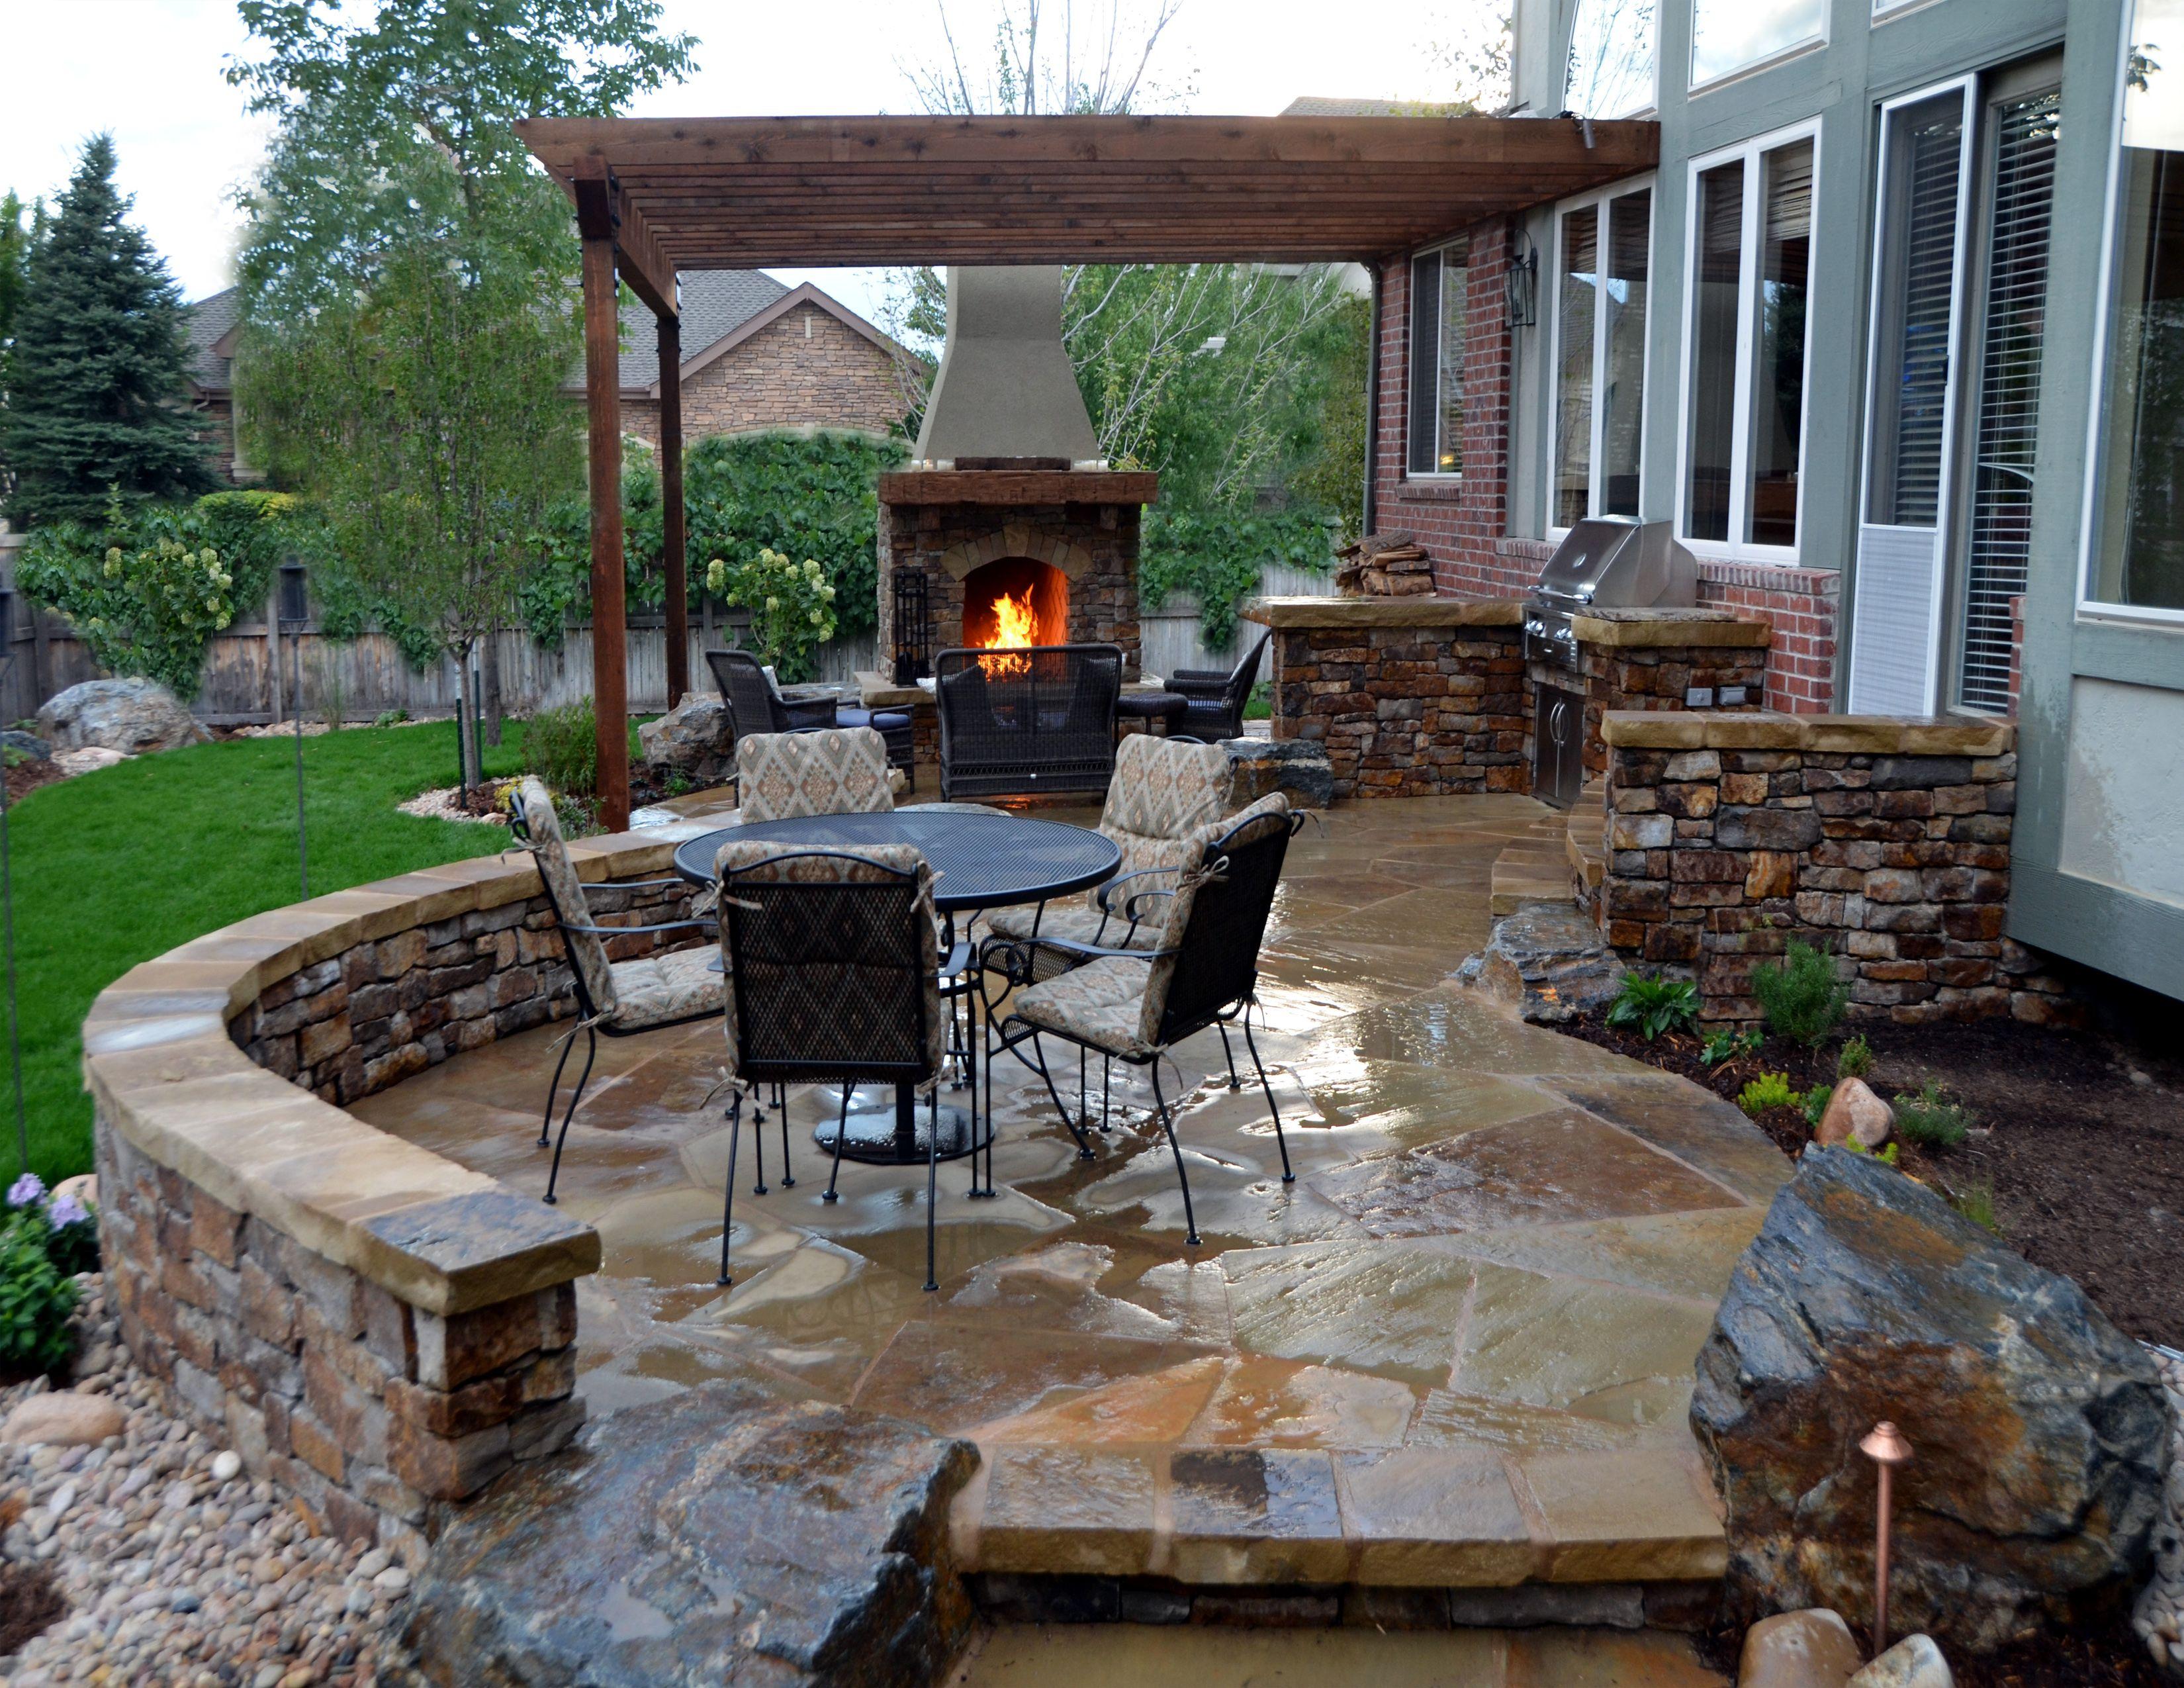 backyard+patios | Flagstone Patio with Stone Fireplace and ... on Small Backyard Stone Patio Ideas id=52638